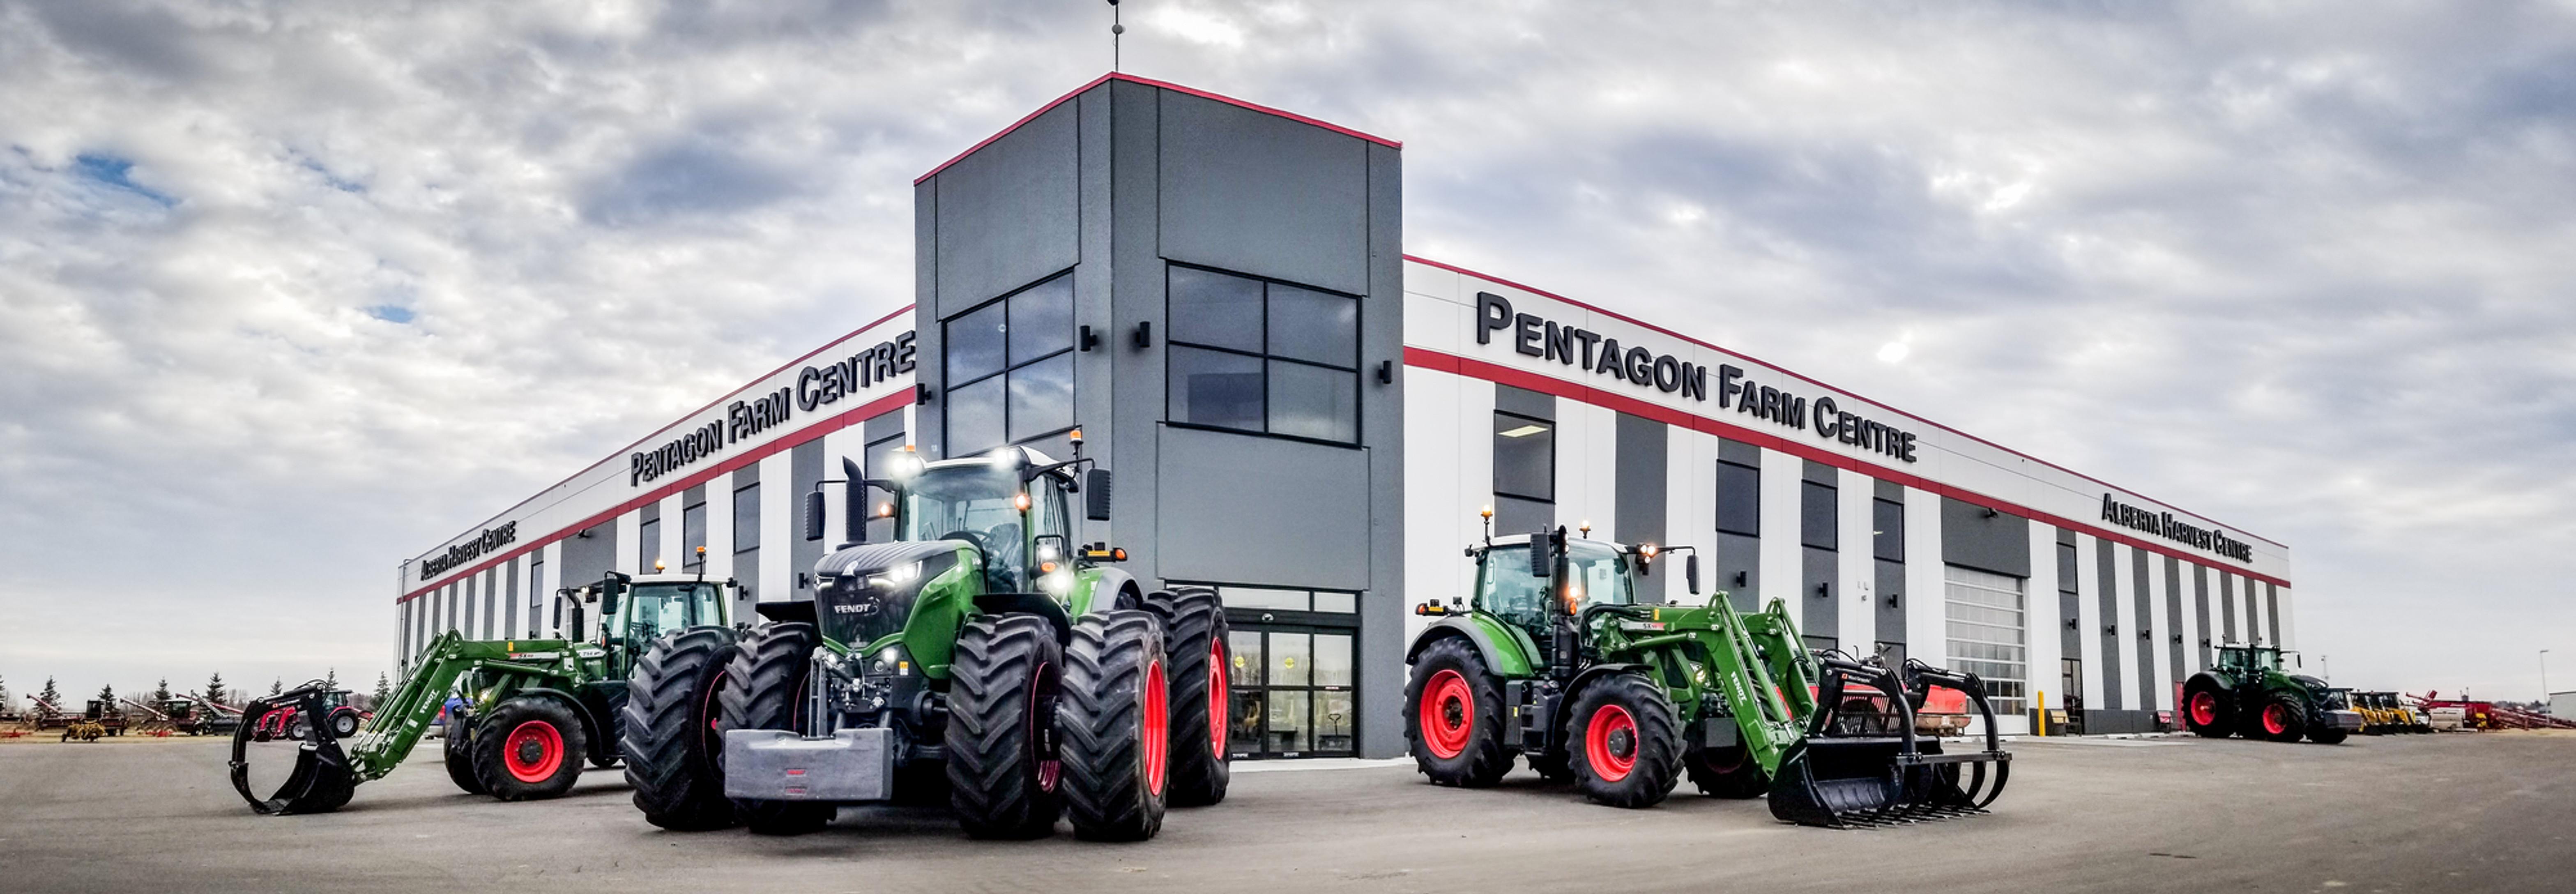 Farm Equipment For Sale In Alberta >> Pentagon Farm Centre Farm Equipment Sales